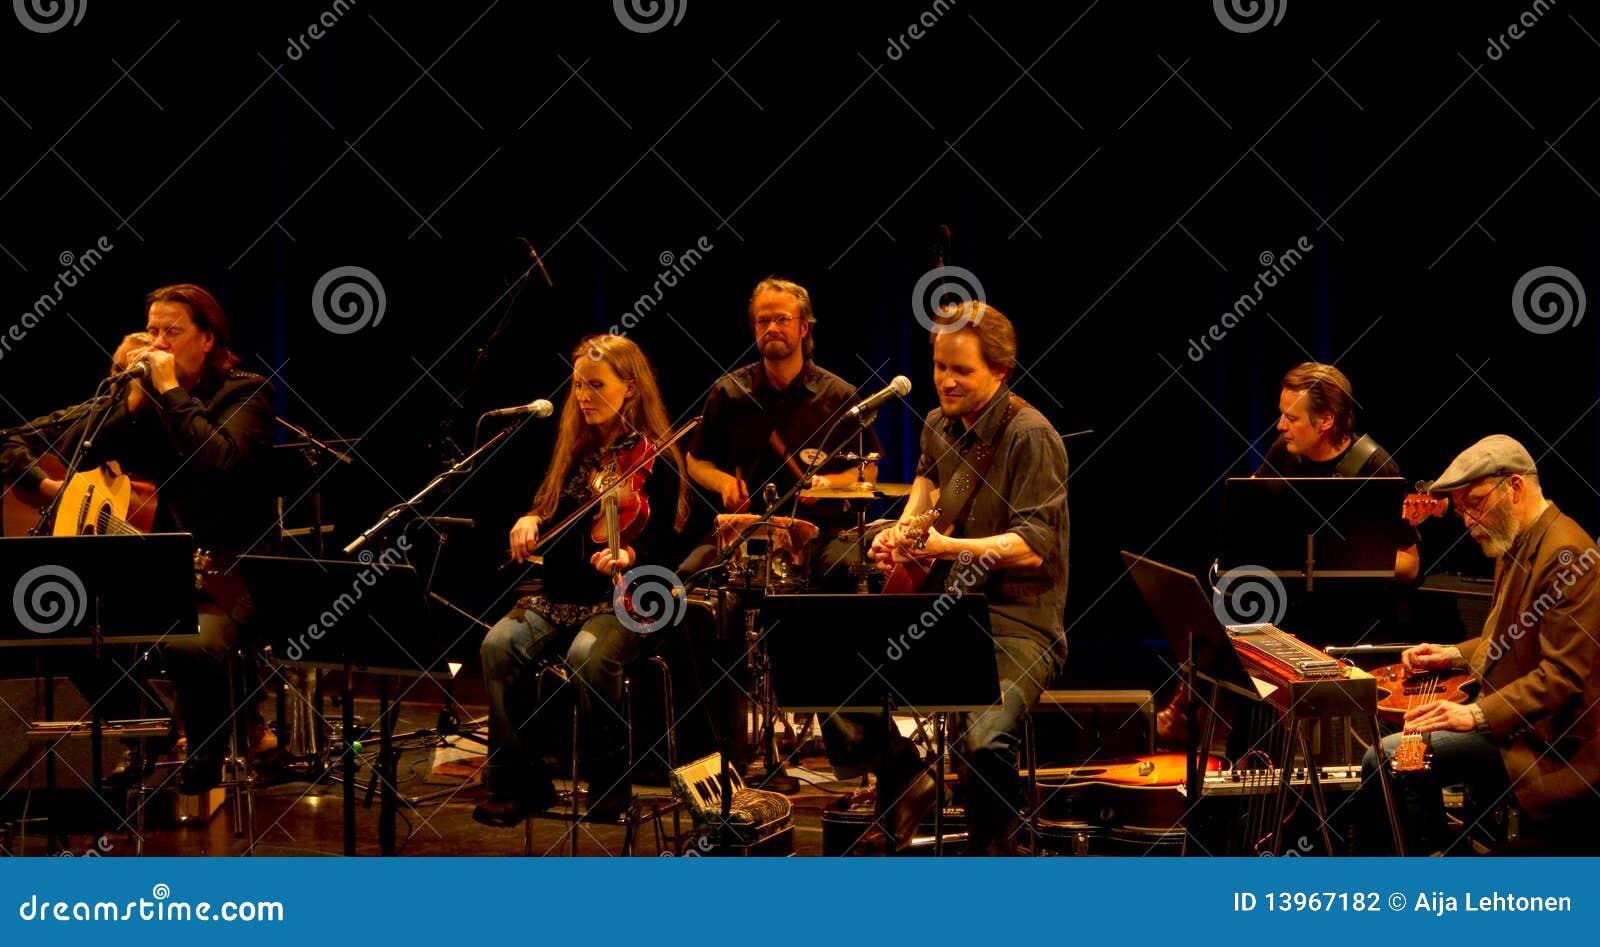 Finnish roots music band Hoedown and Kaartamo, Ket